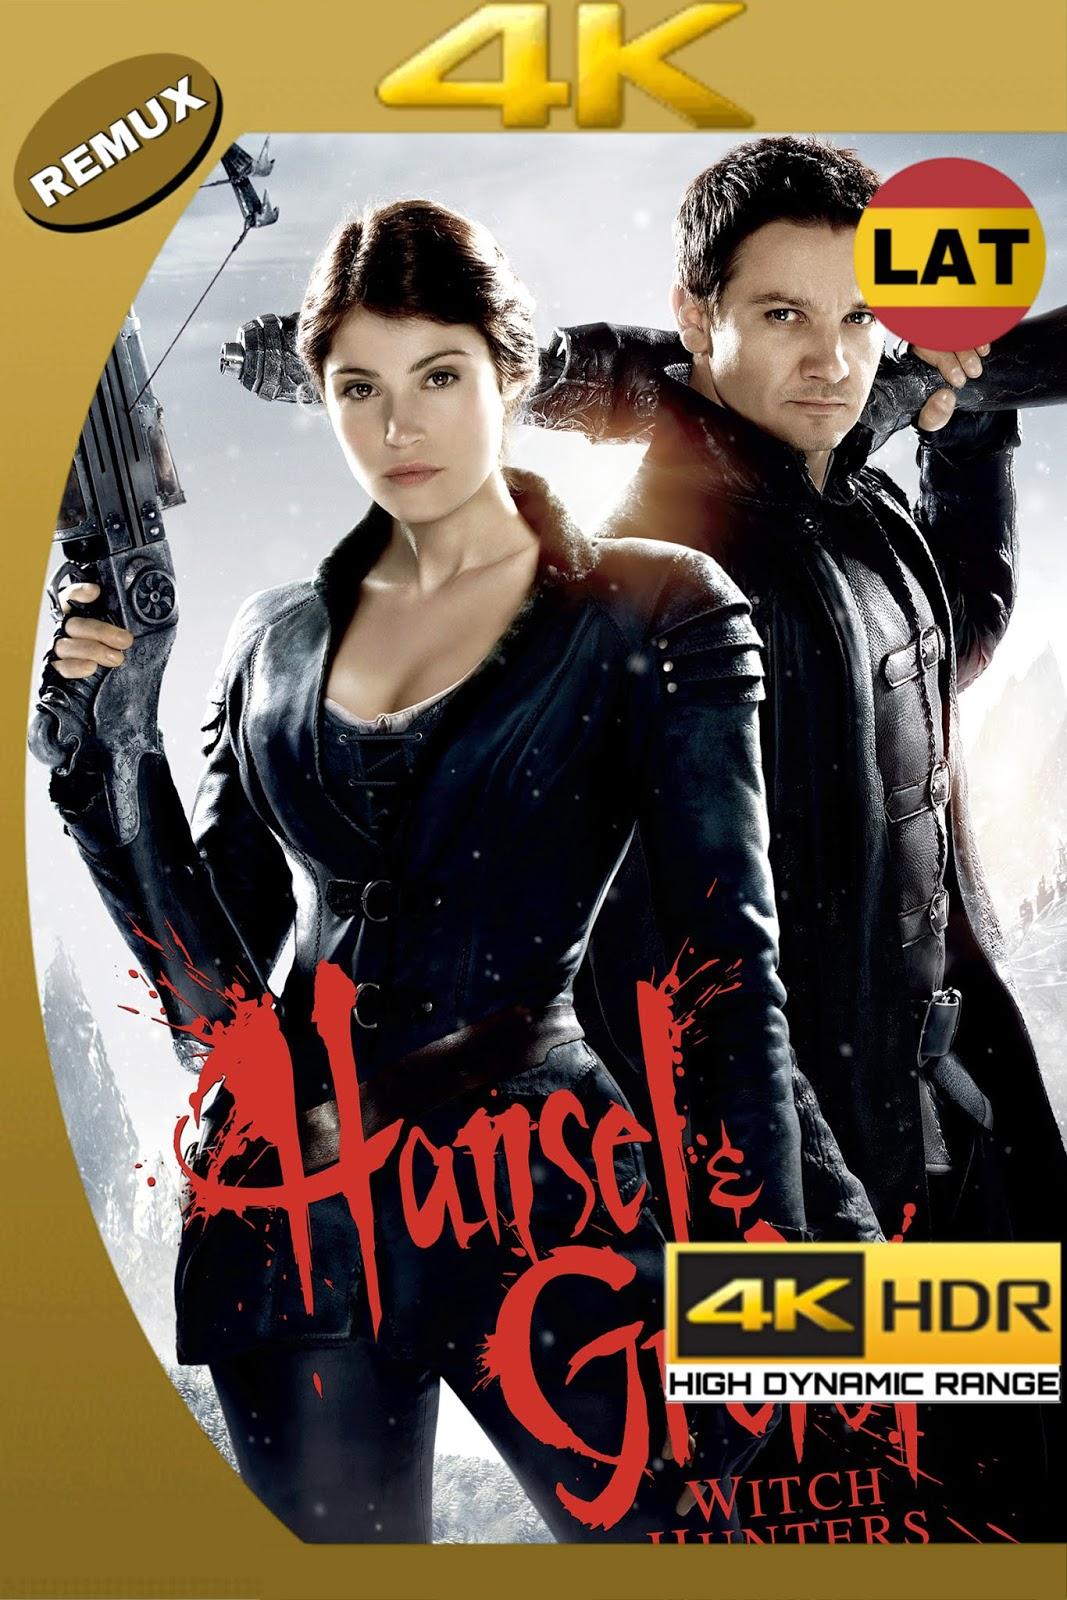 HANSEL Y GRETEL: CAZADORES DE BRUJAS 2013 LAT-ING ULTRA HD 4K HDR BDREMUX 2160P 55GB.mkv